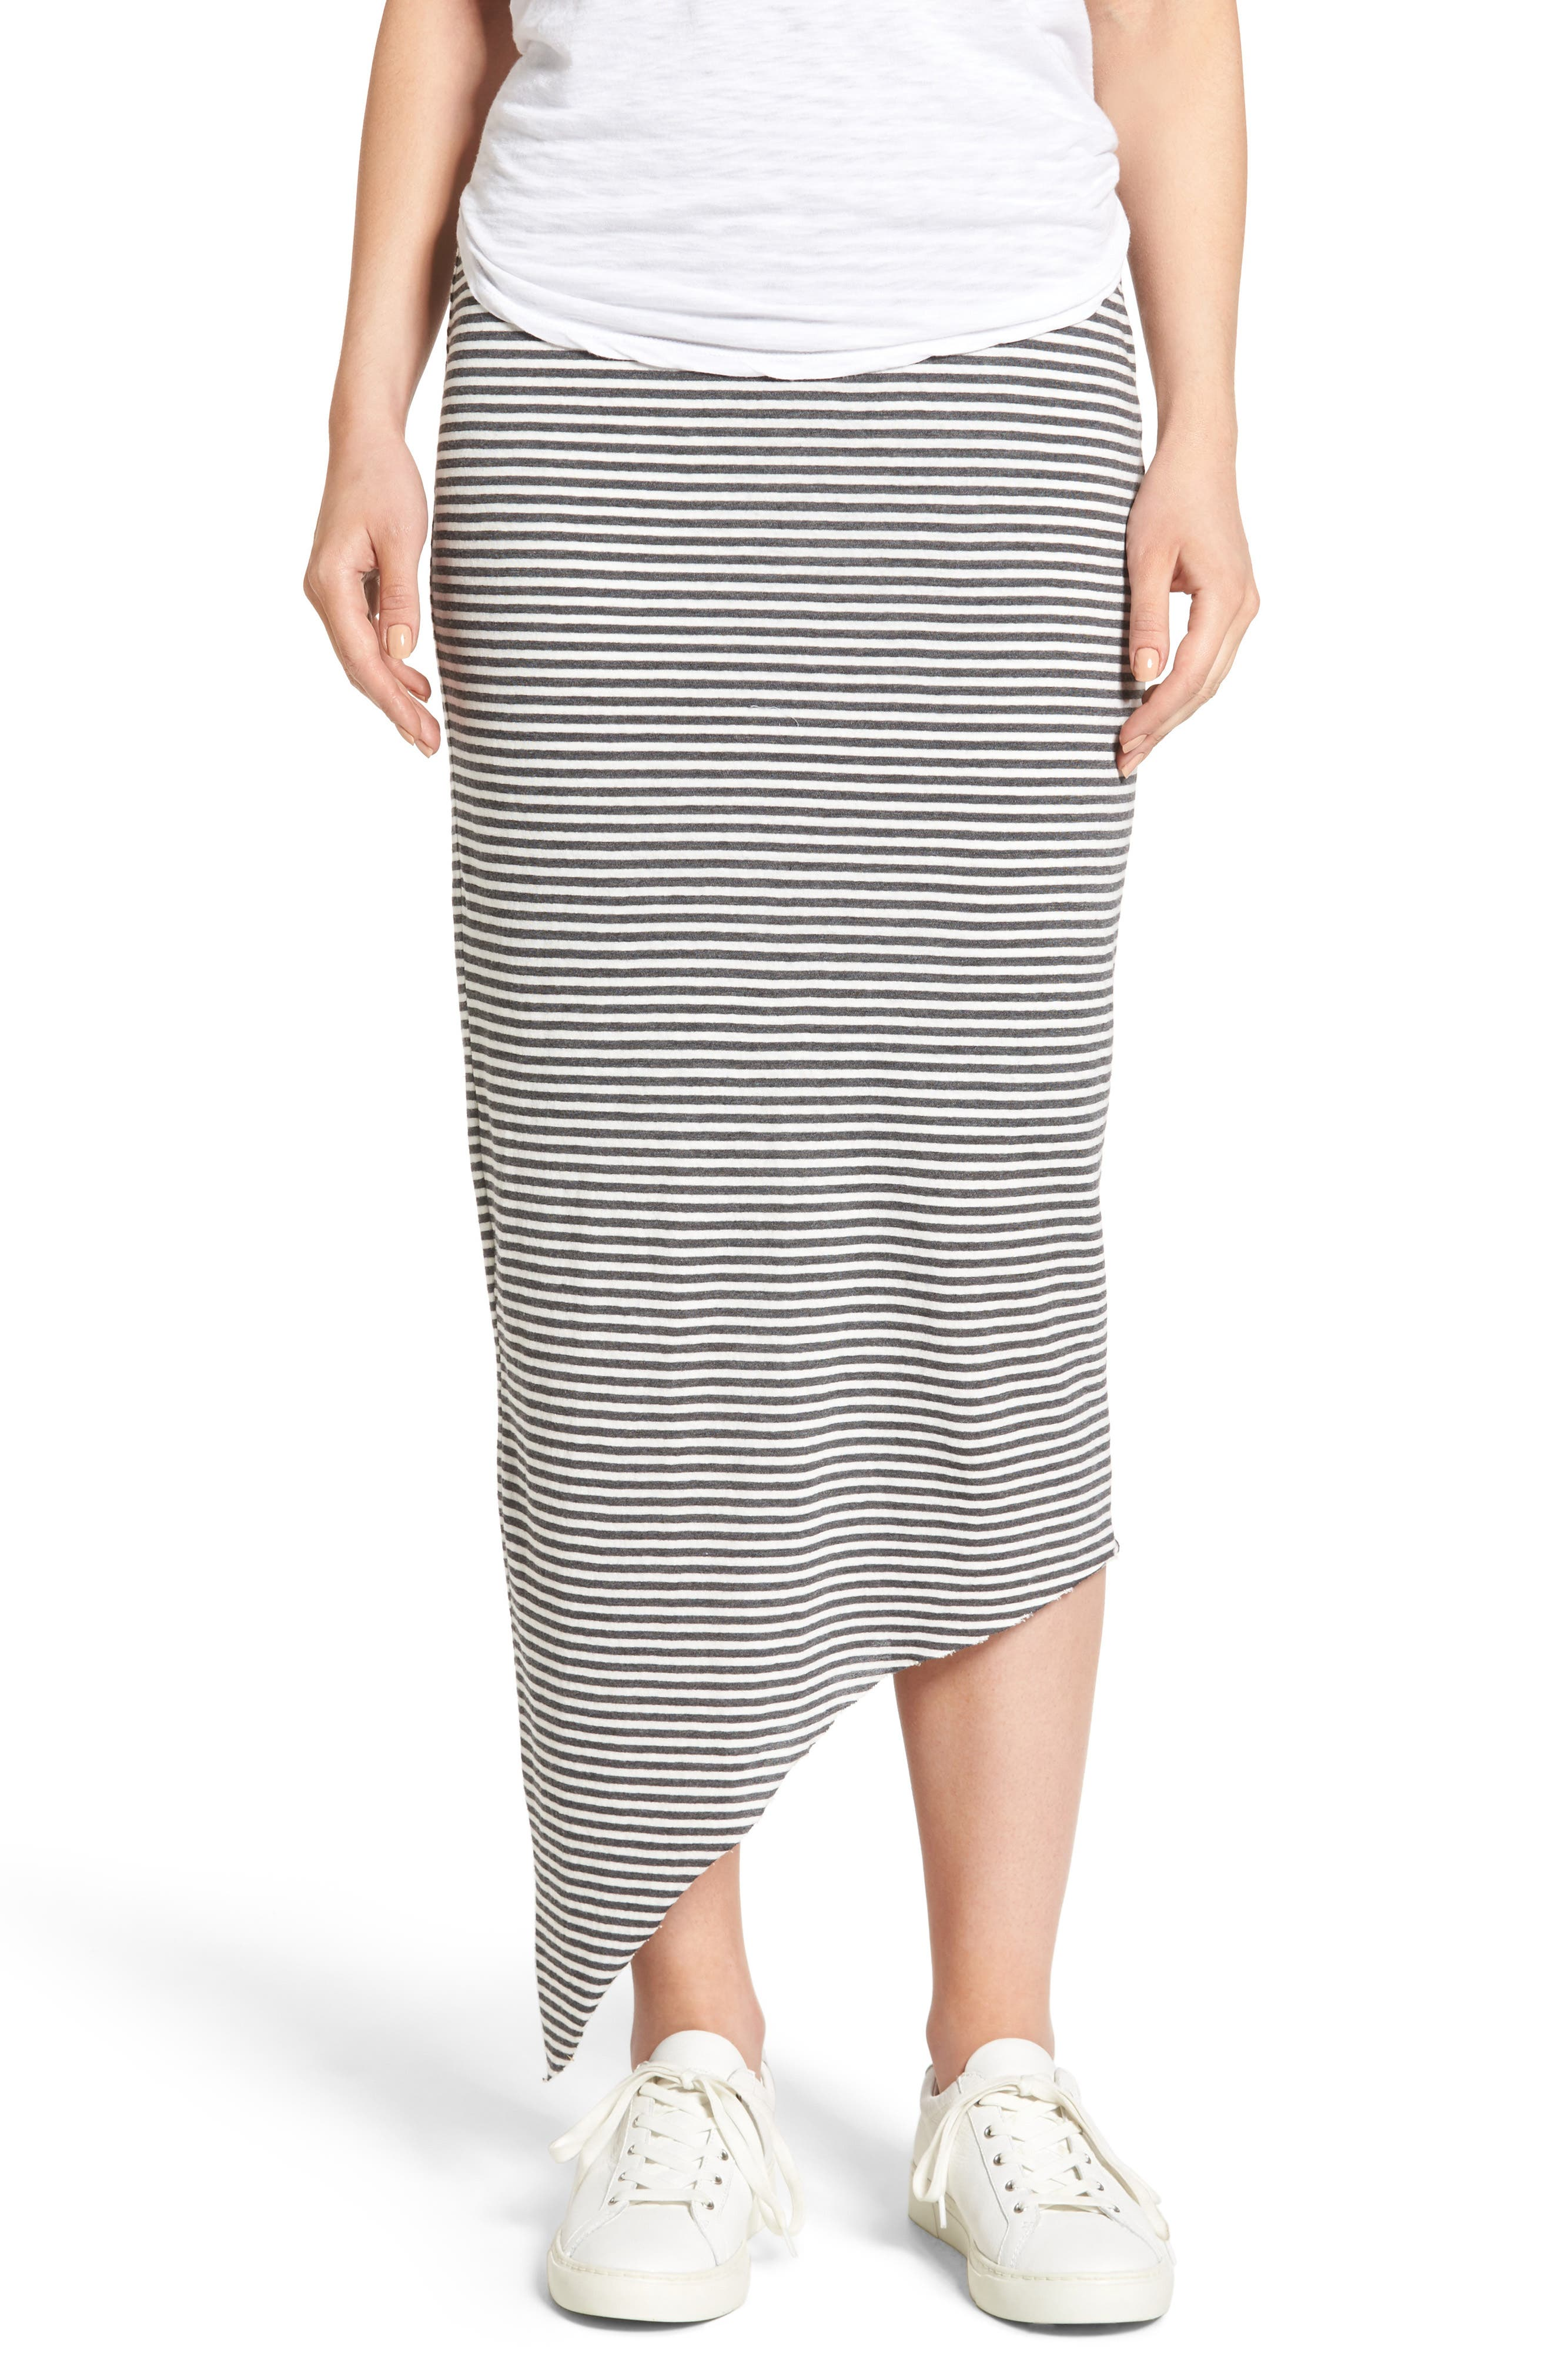 Frank & Eileen Tee Lab Asymmetrical Maxi Skirt